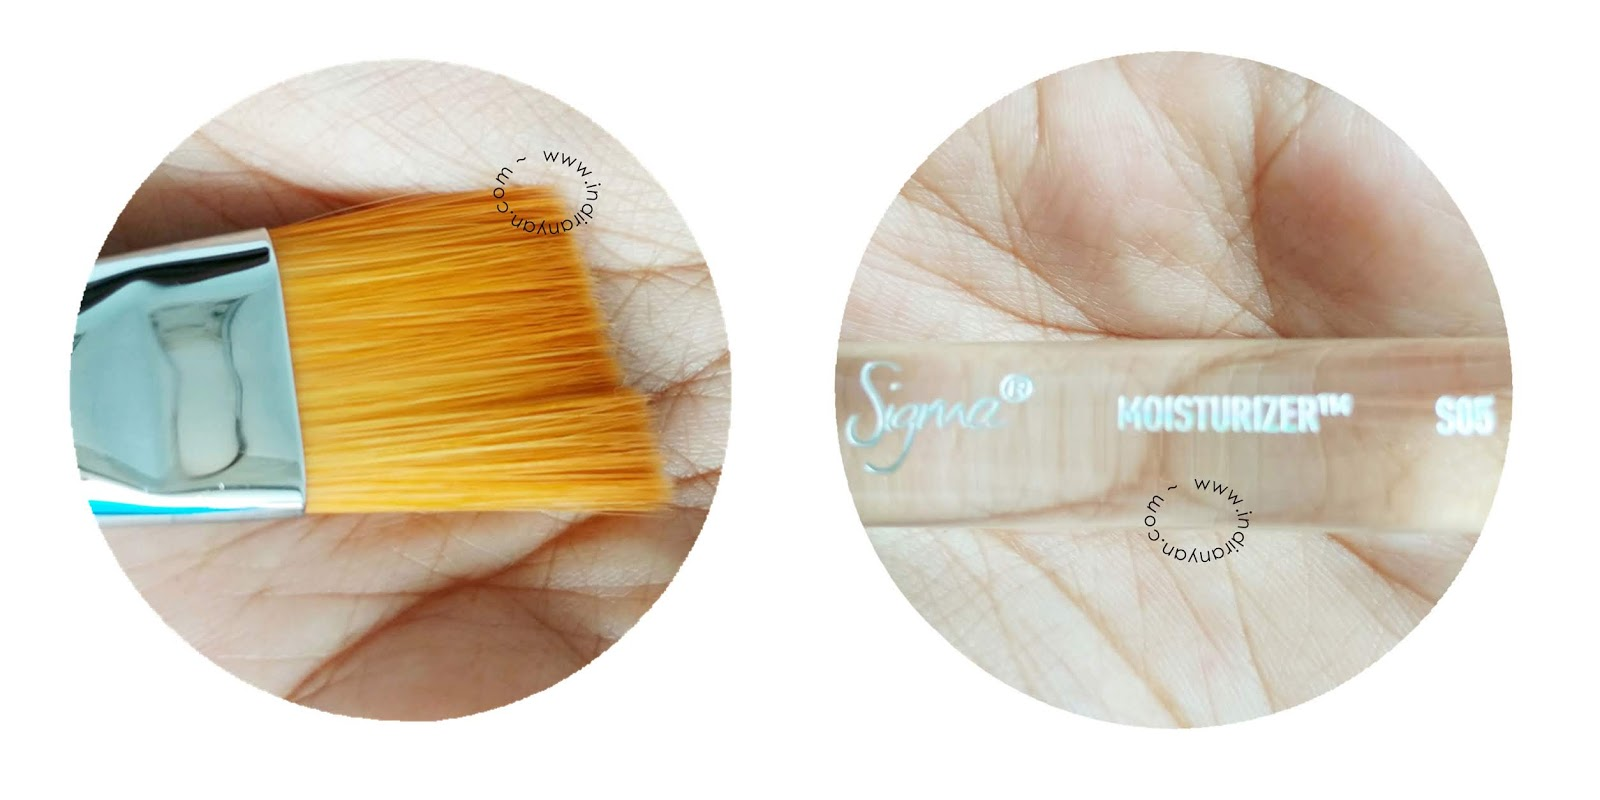 sigma-skincare-brush, sigma-s05-moisturizer